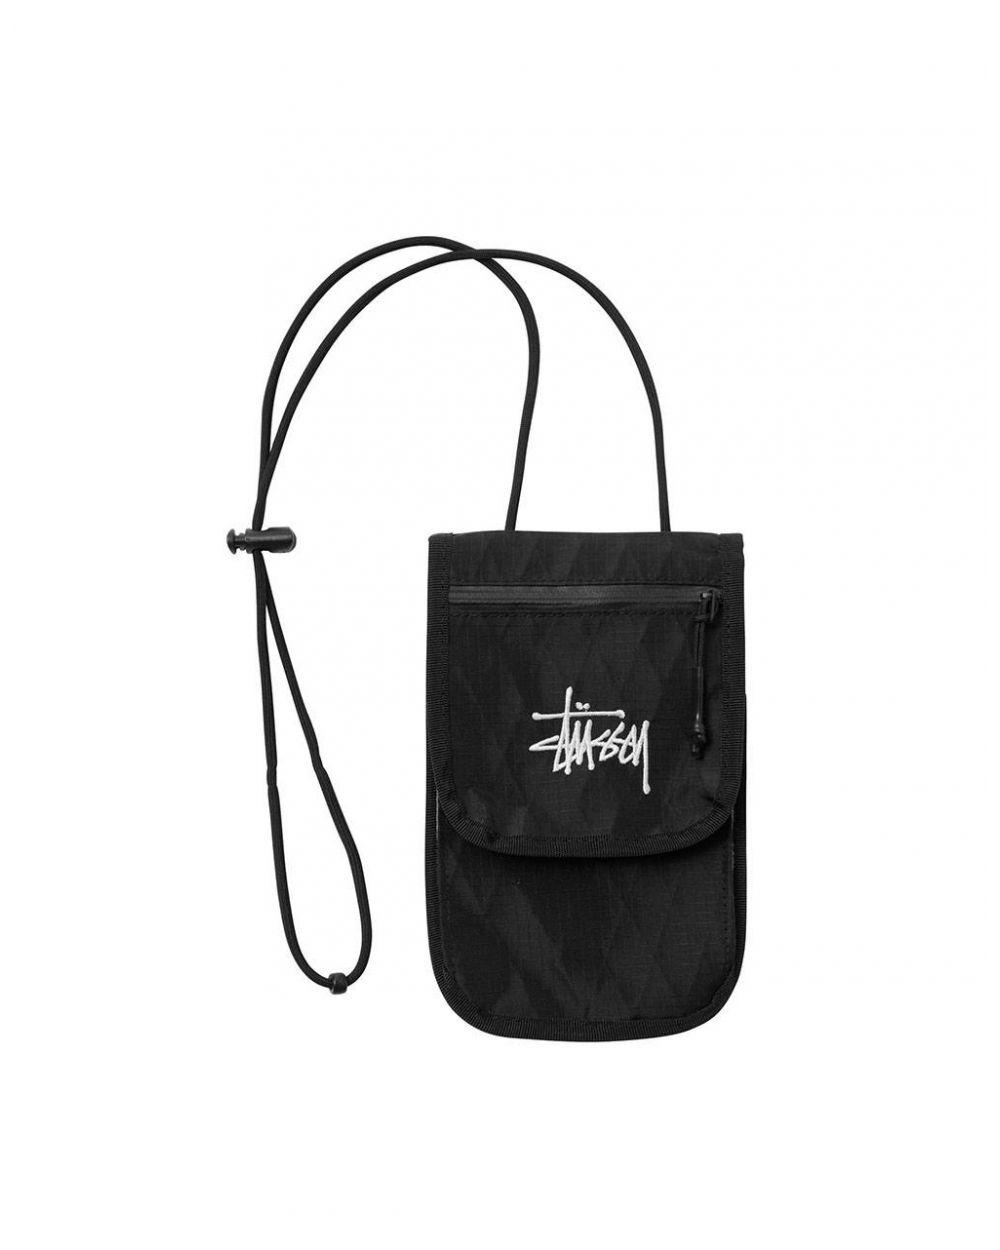 Stussy travel pouch bag - black Stussy Backpack 45,08€